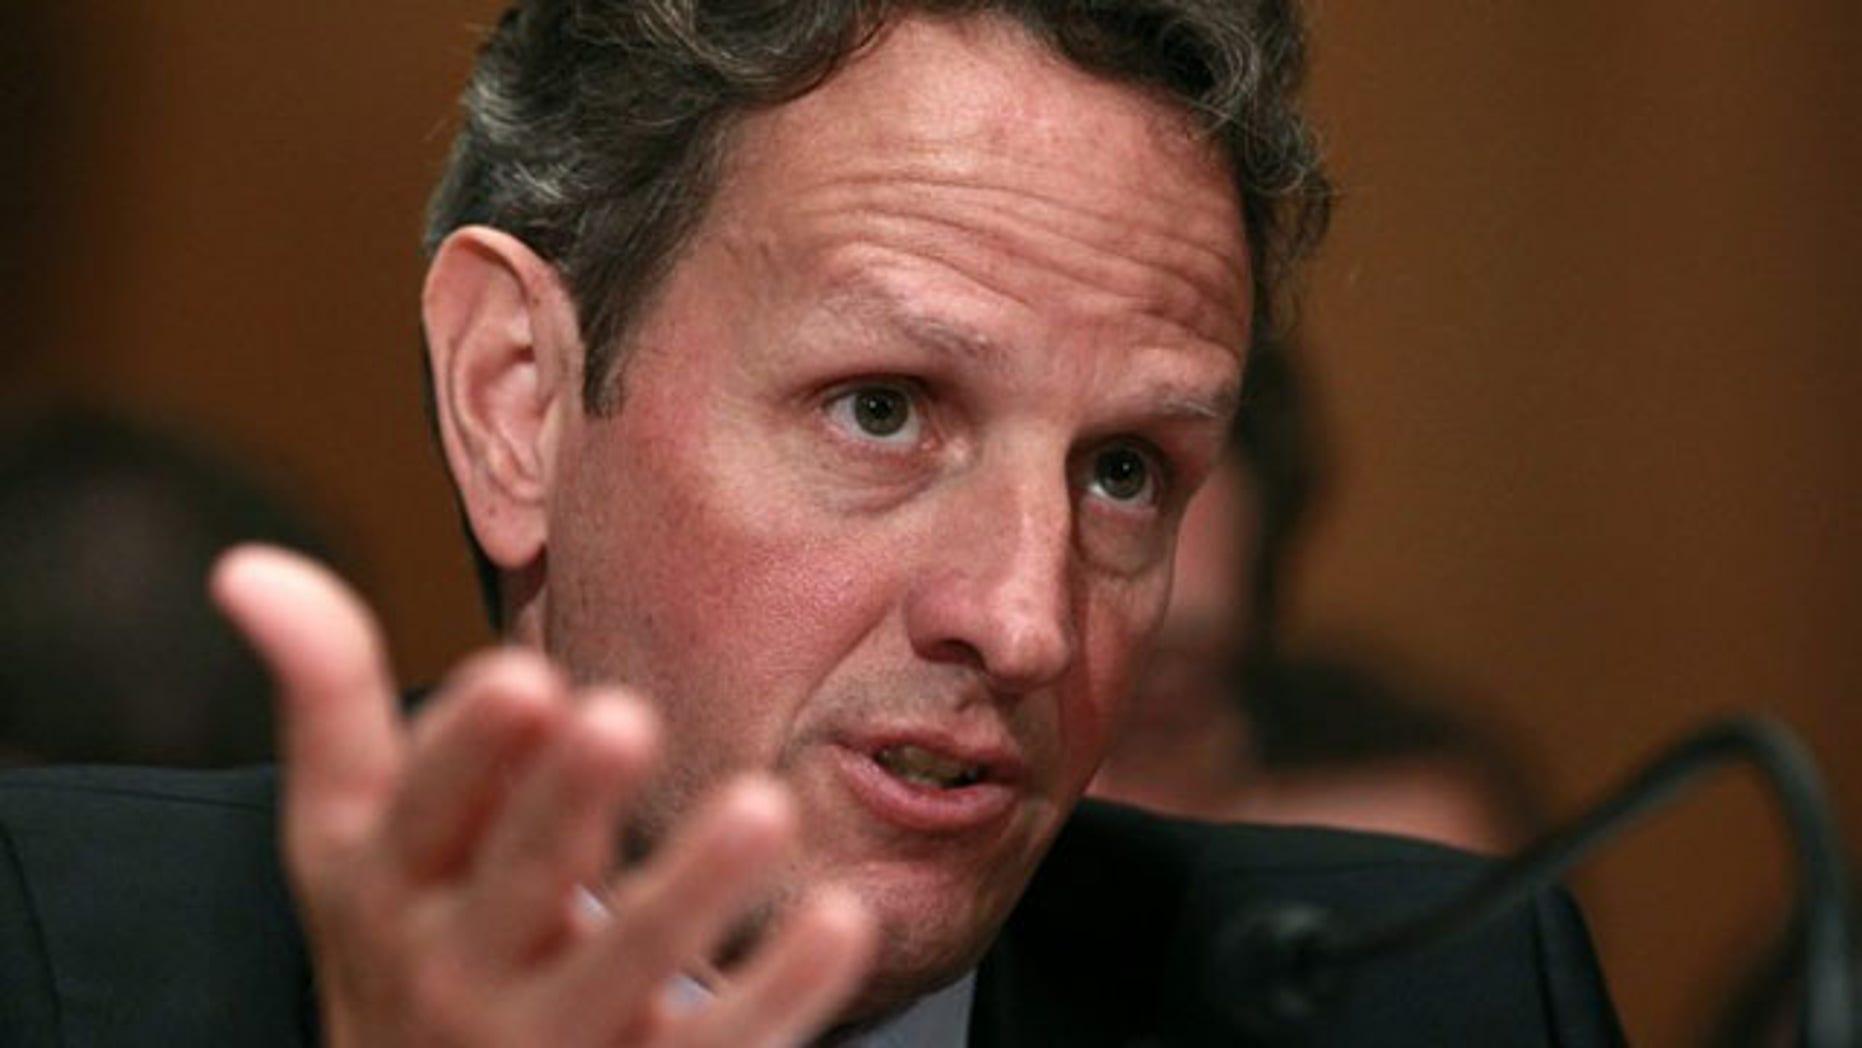 Treasury Secretary Tim Geithner testifies before a congressional panel in Washington, D.C., June 22. (Reuters Photo)